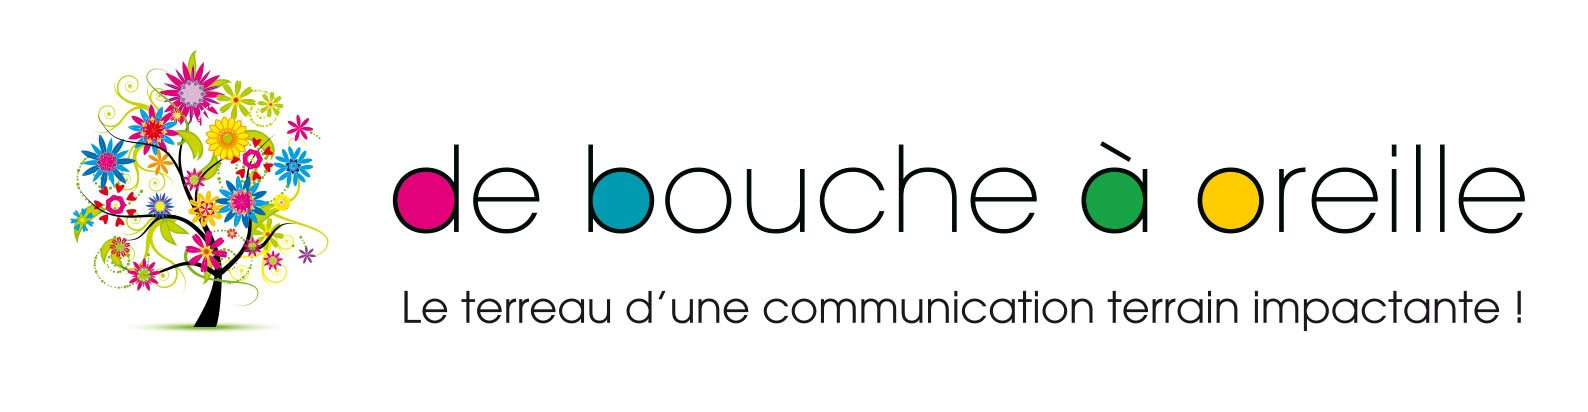 https://www.deboucheaoreille.fr/